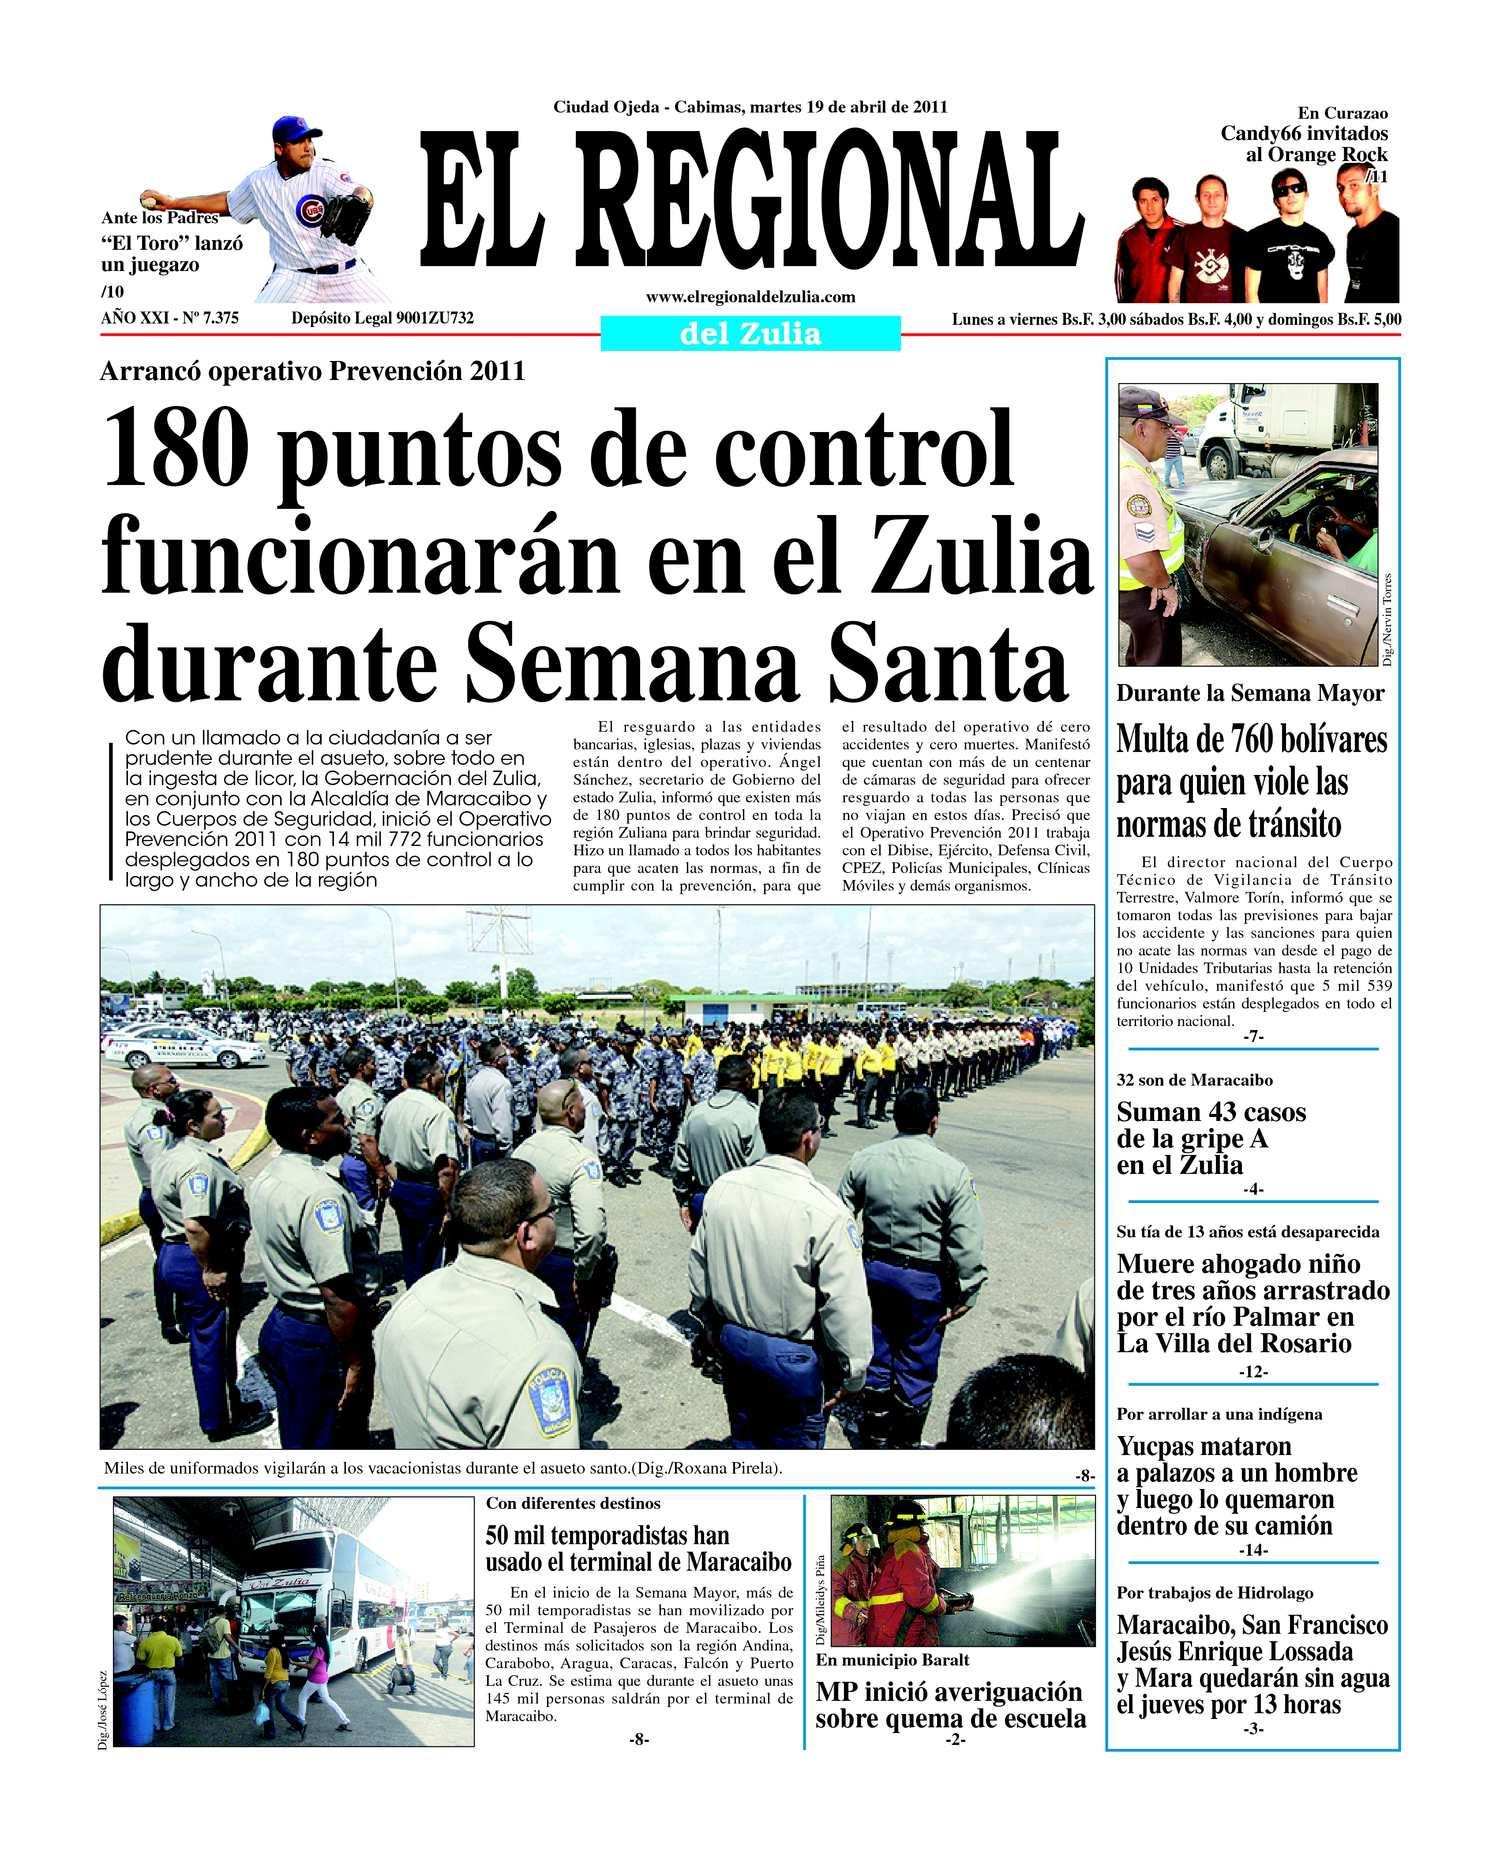 Calaméo - El Regional del Zulia 19-04-2011